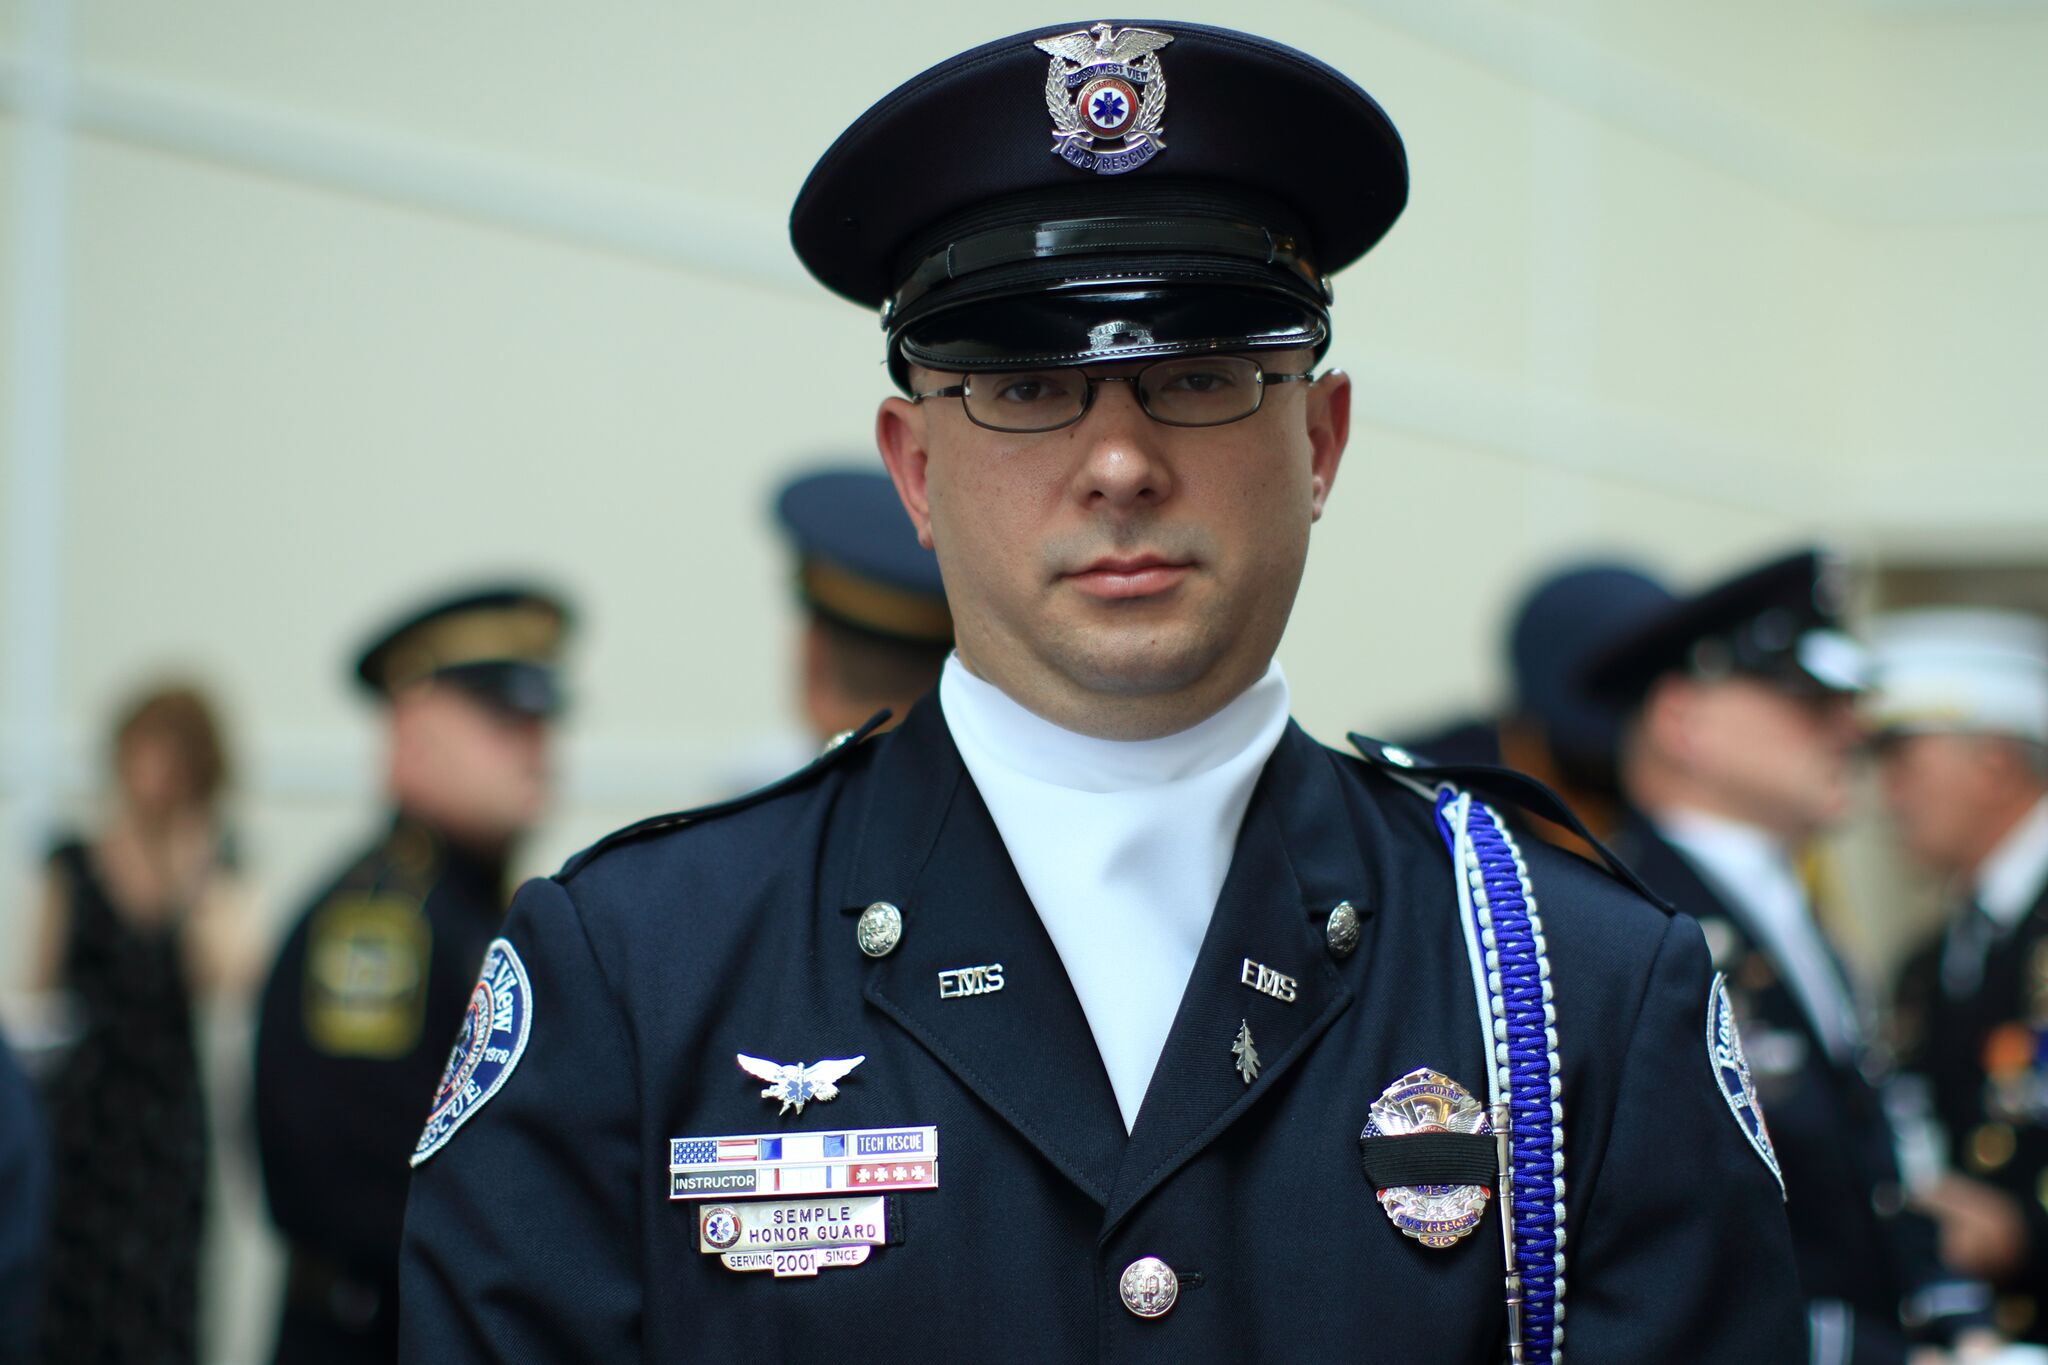 A firefighter in uniform